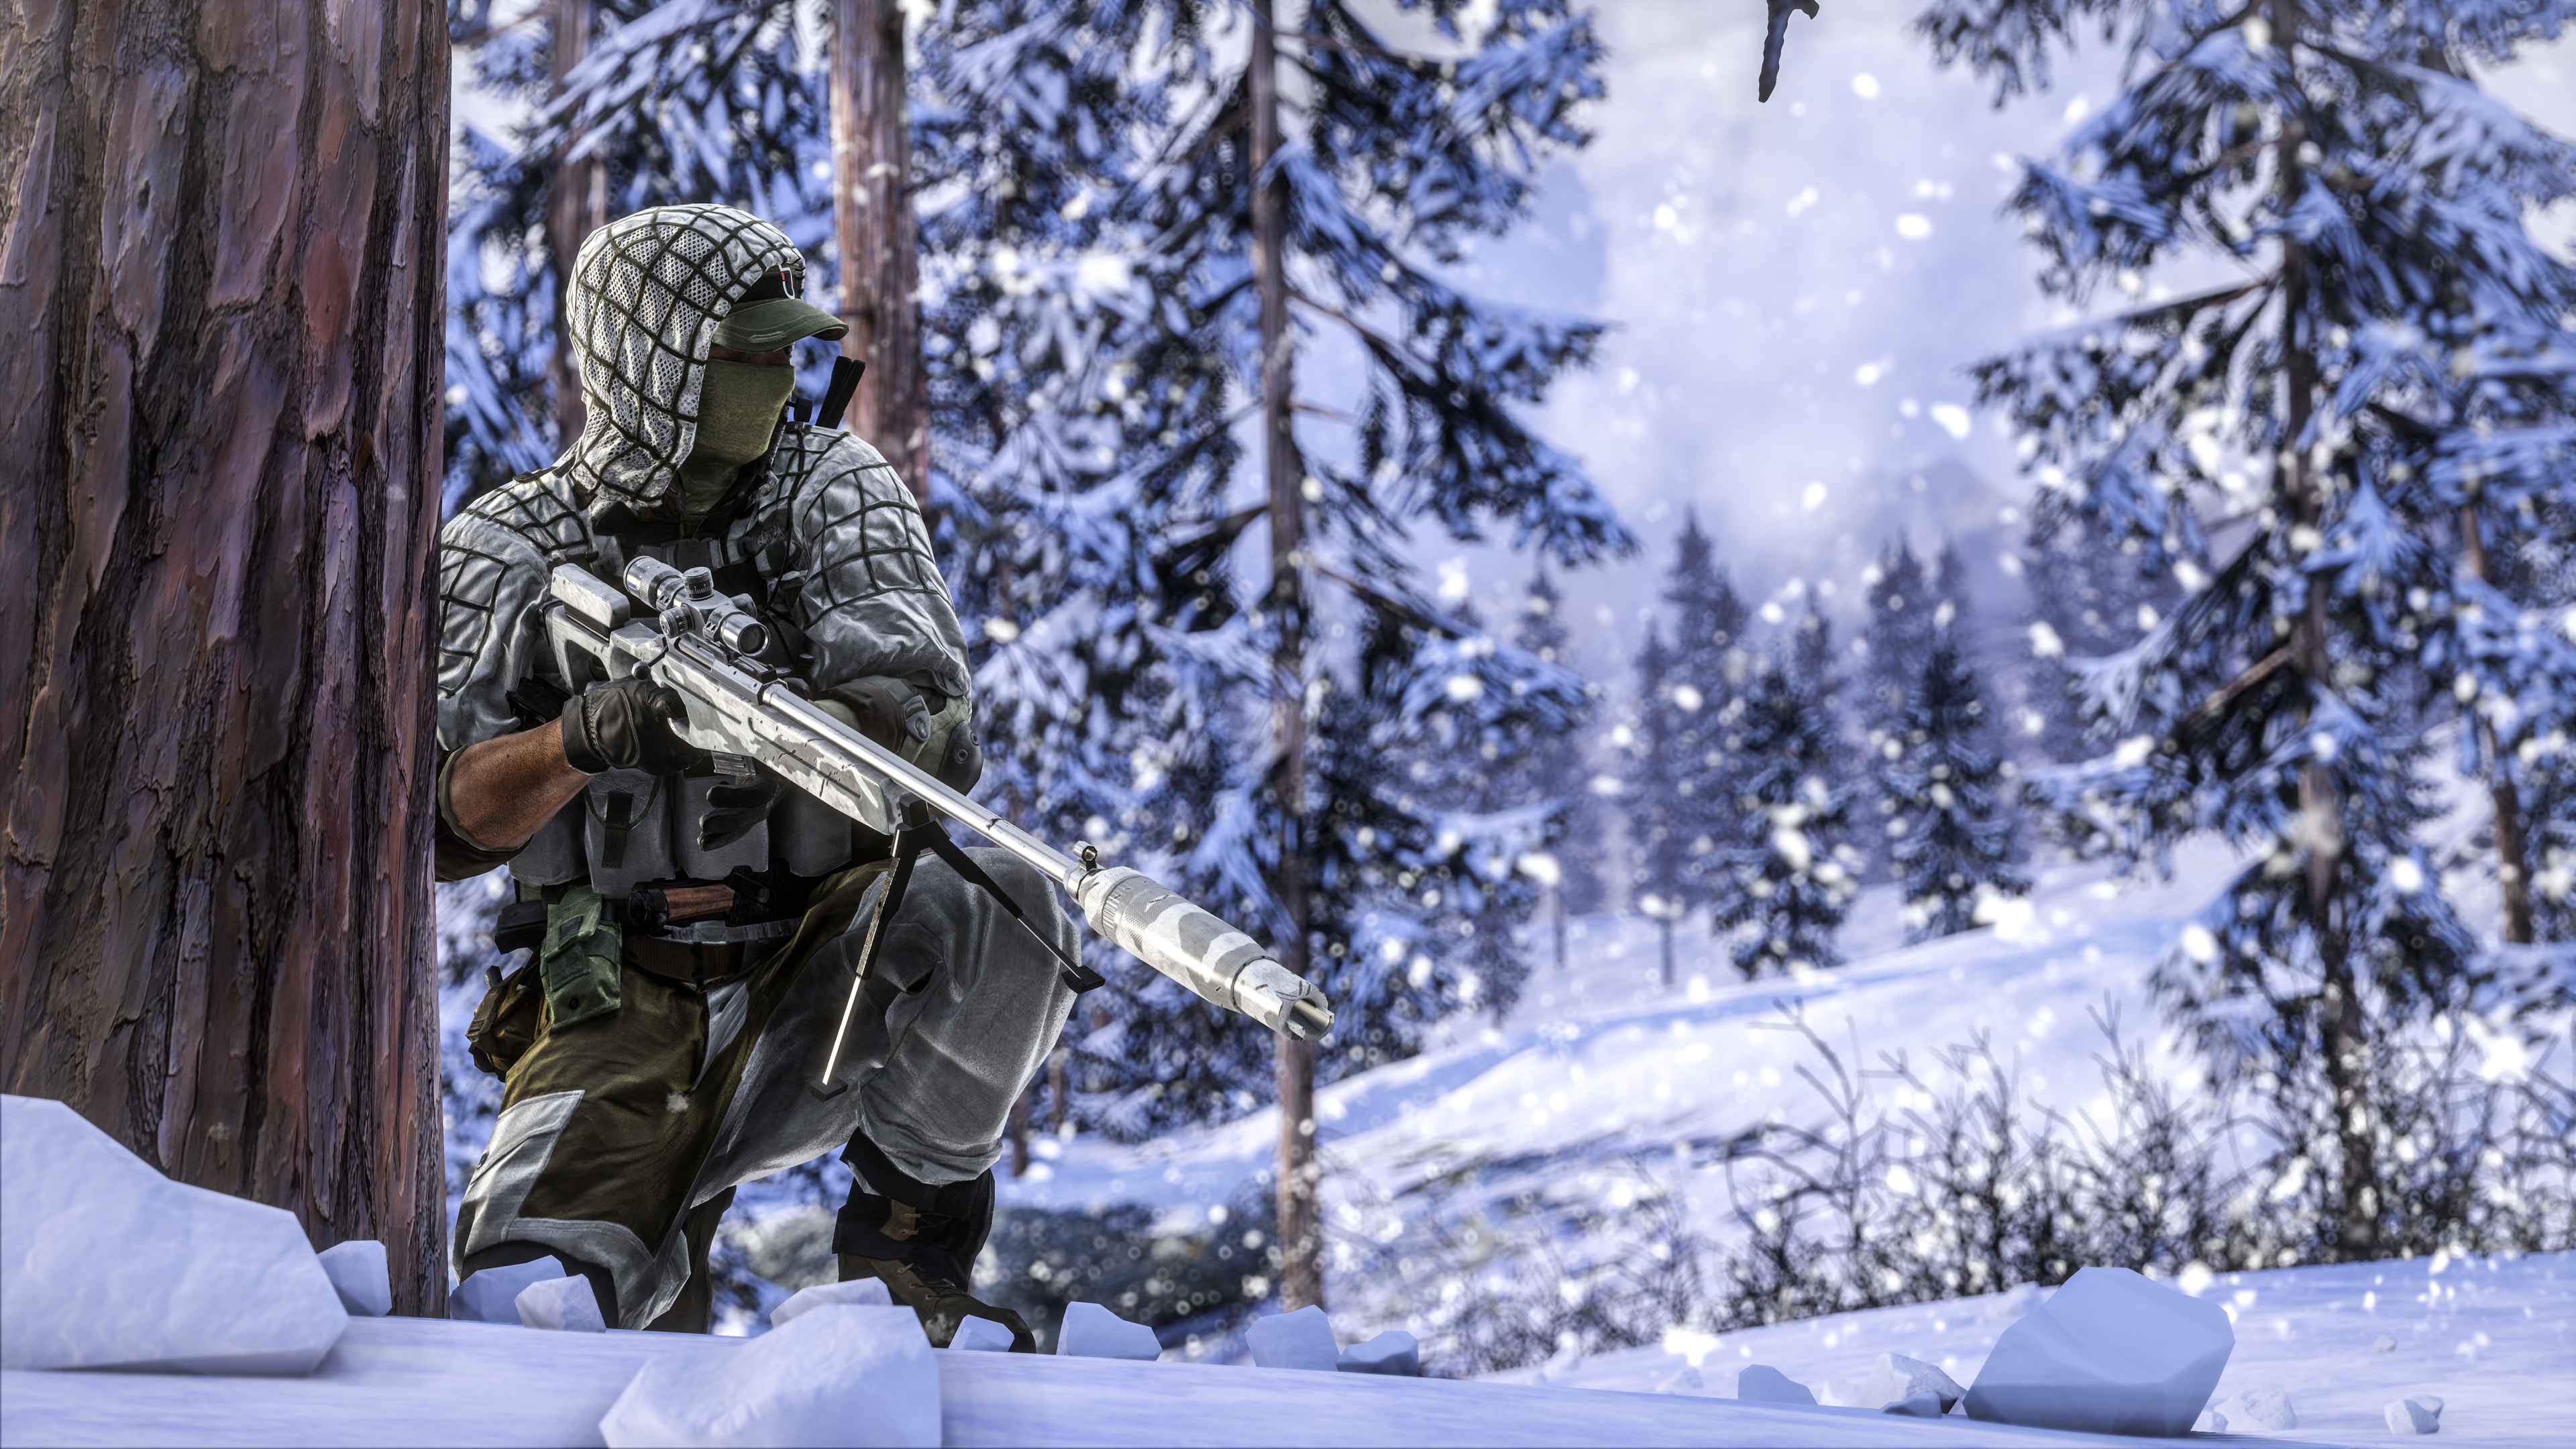 Battlefield 4 Full Hd Fond D écran And Arrière Plan: Battlefield 4 4k Ultra Fond D'écran HD